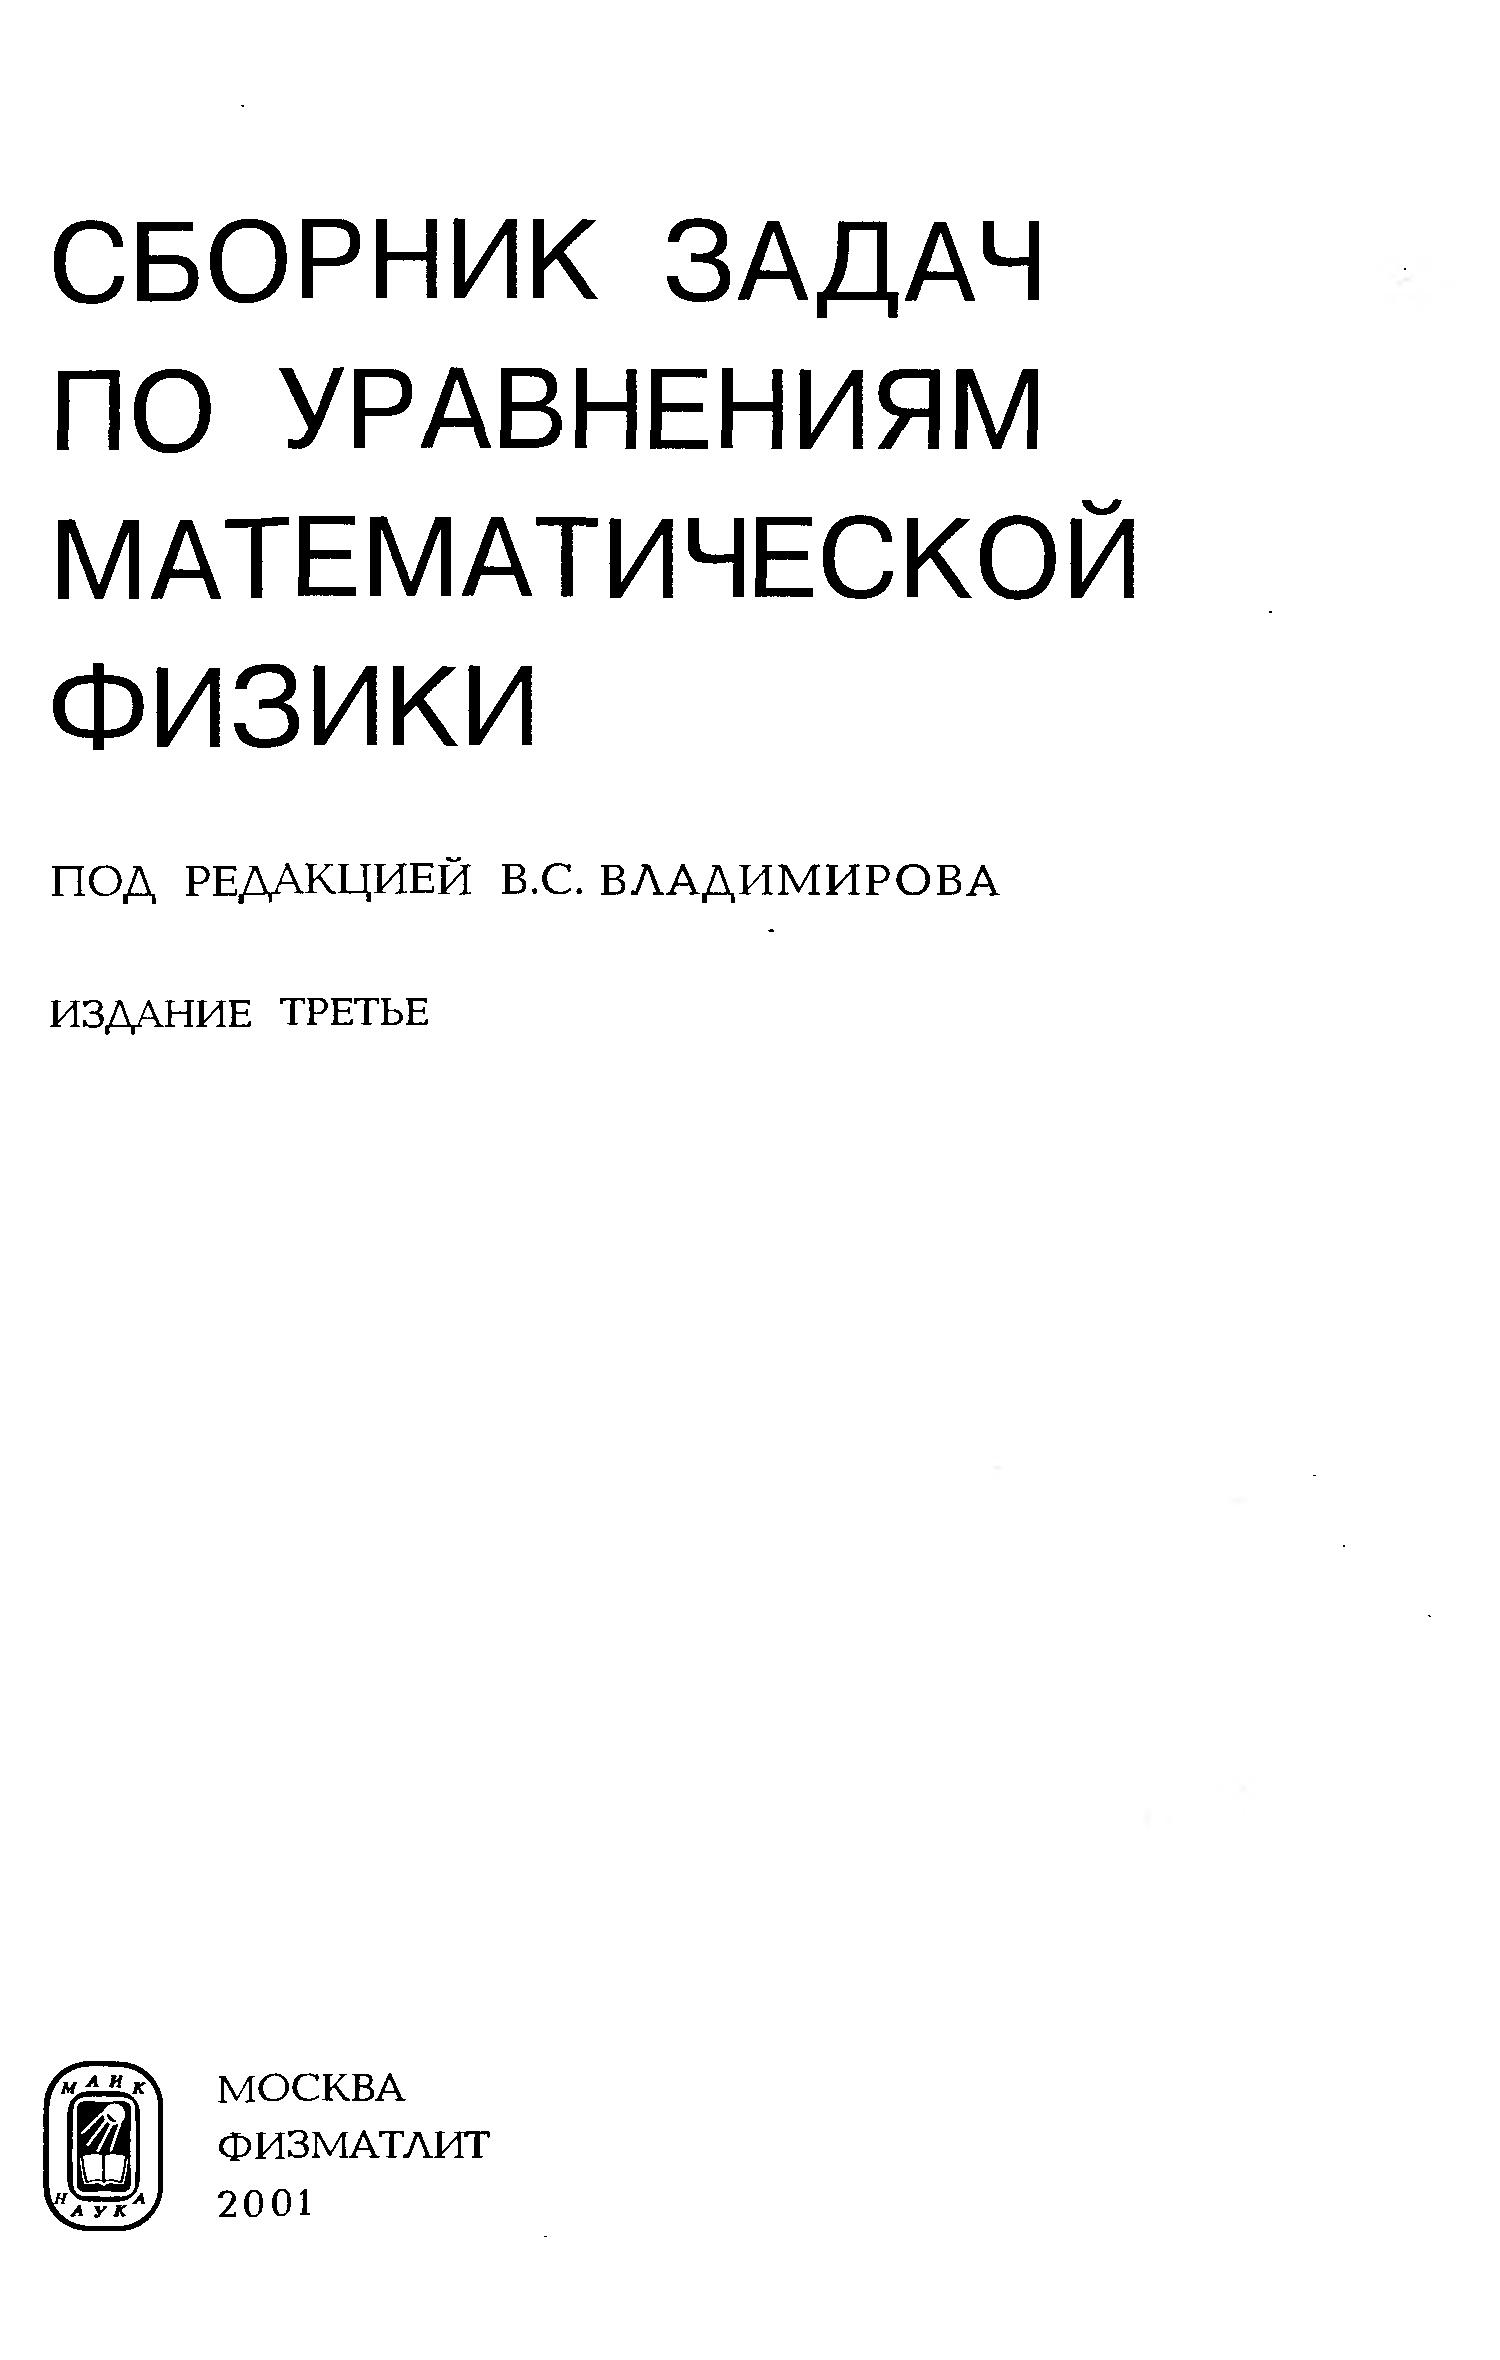 Физики уравнениям задачник по мат